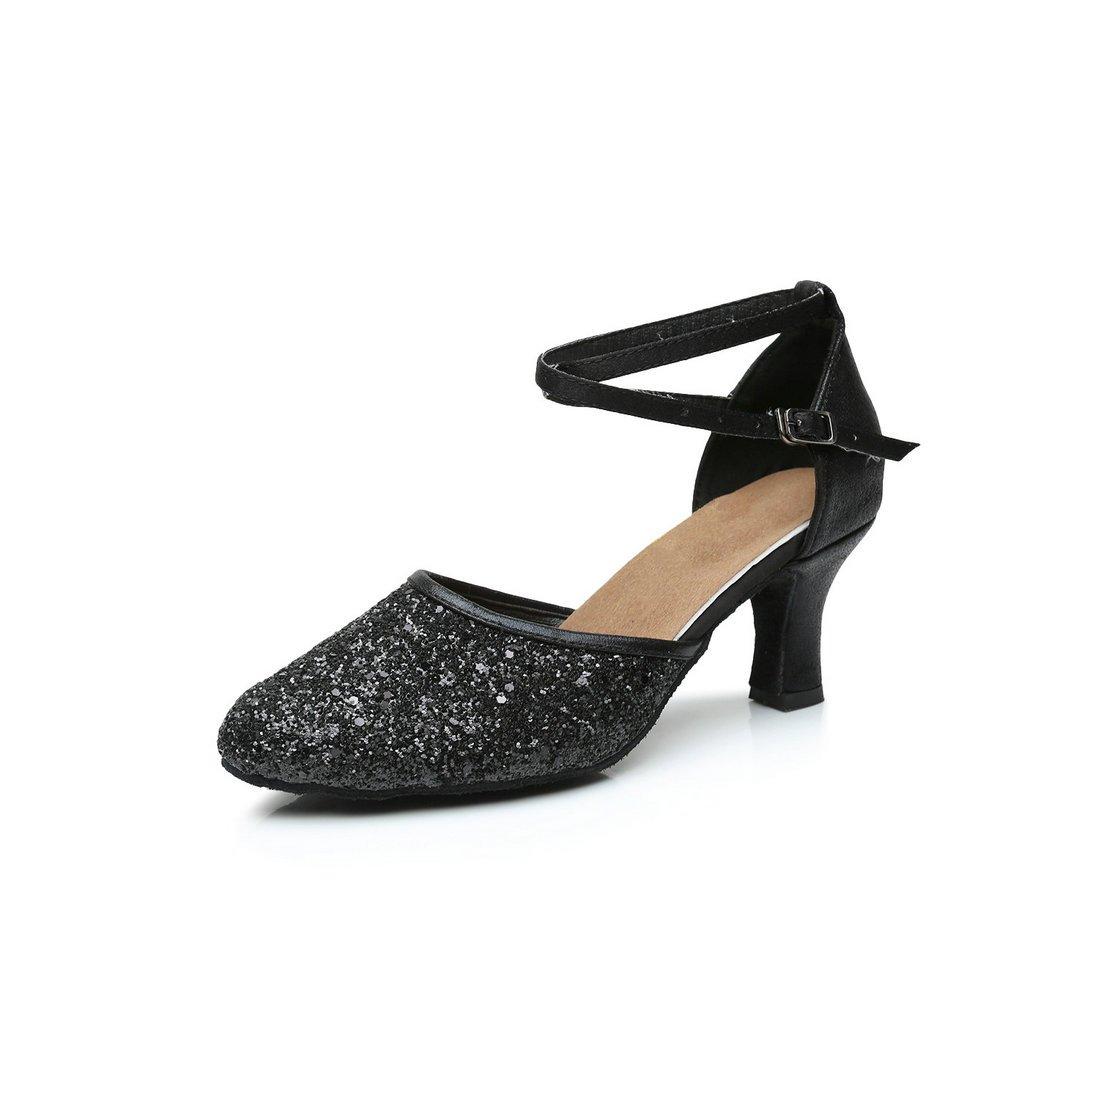 GetMine Womens Latin Dance Shoes Heeled Ballroom Salsa Tango Party Sequin Dance Shoes